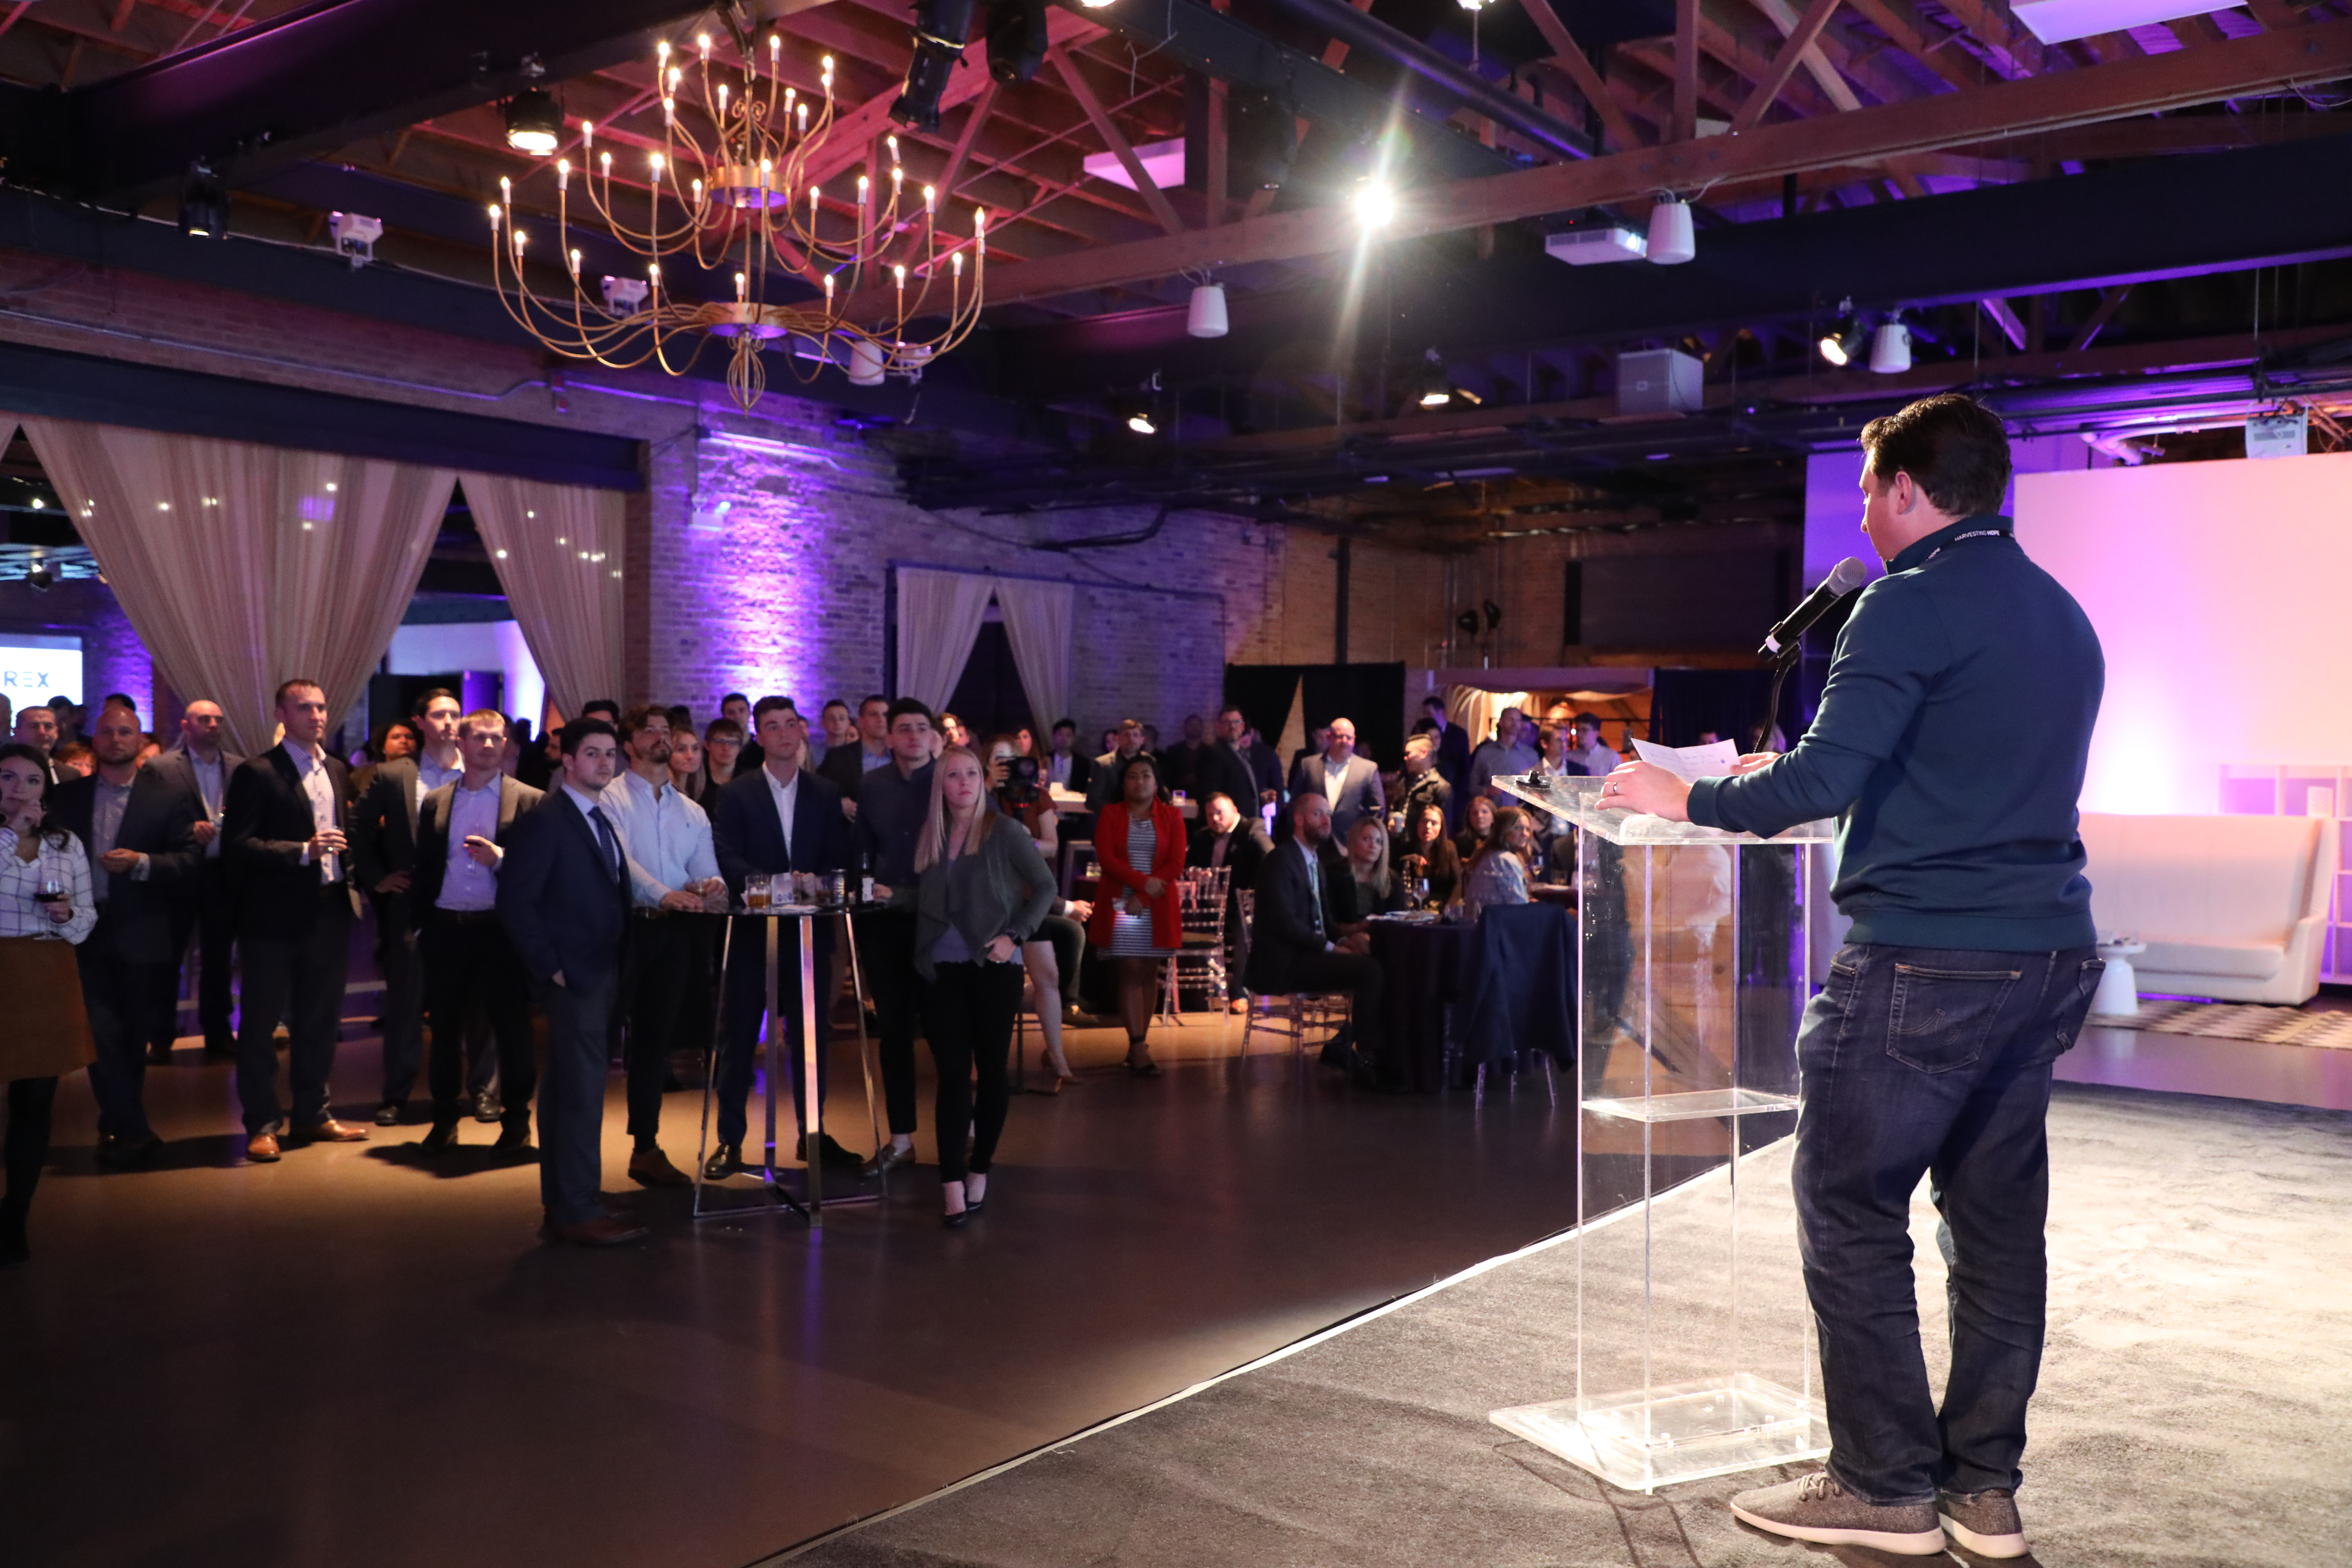 Eighth Annual Harvesting Hope Raises $43,000 for Chicago Coalition for the Homeless